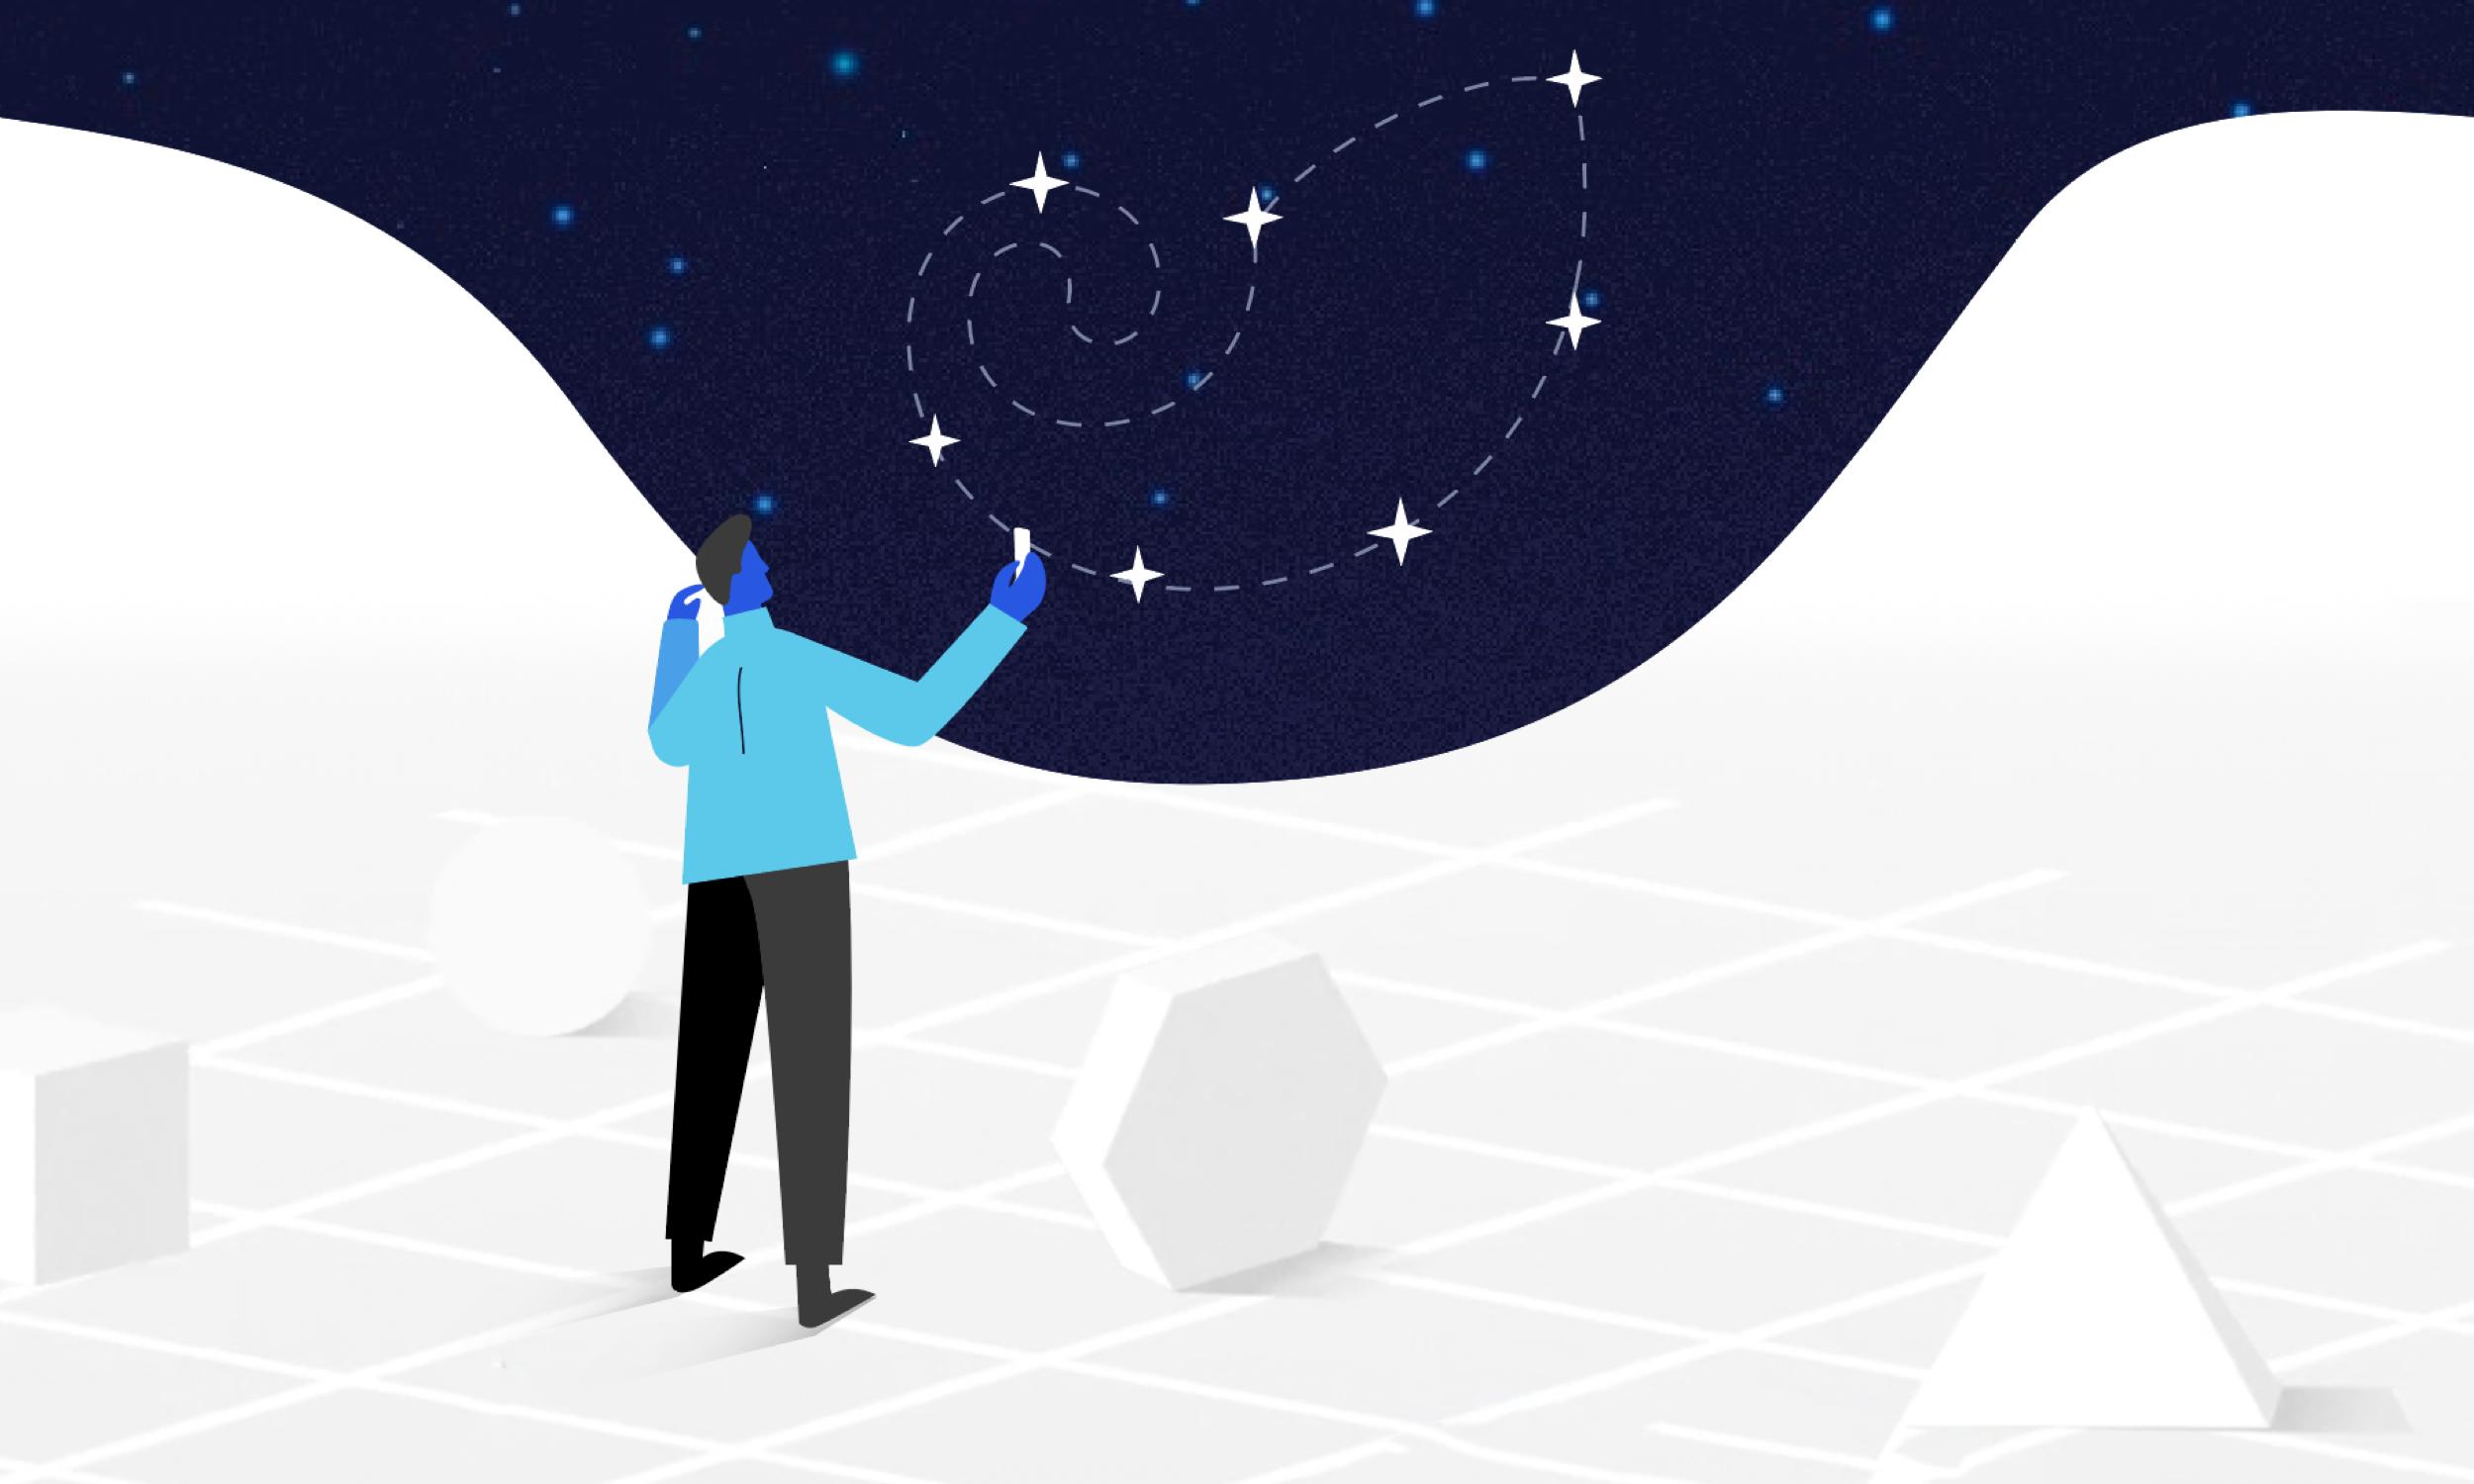 Progress Update | 2019/08/09 - Tokenlon launch, Nervos partnership